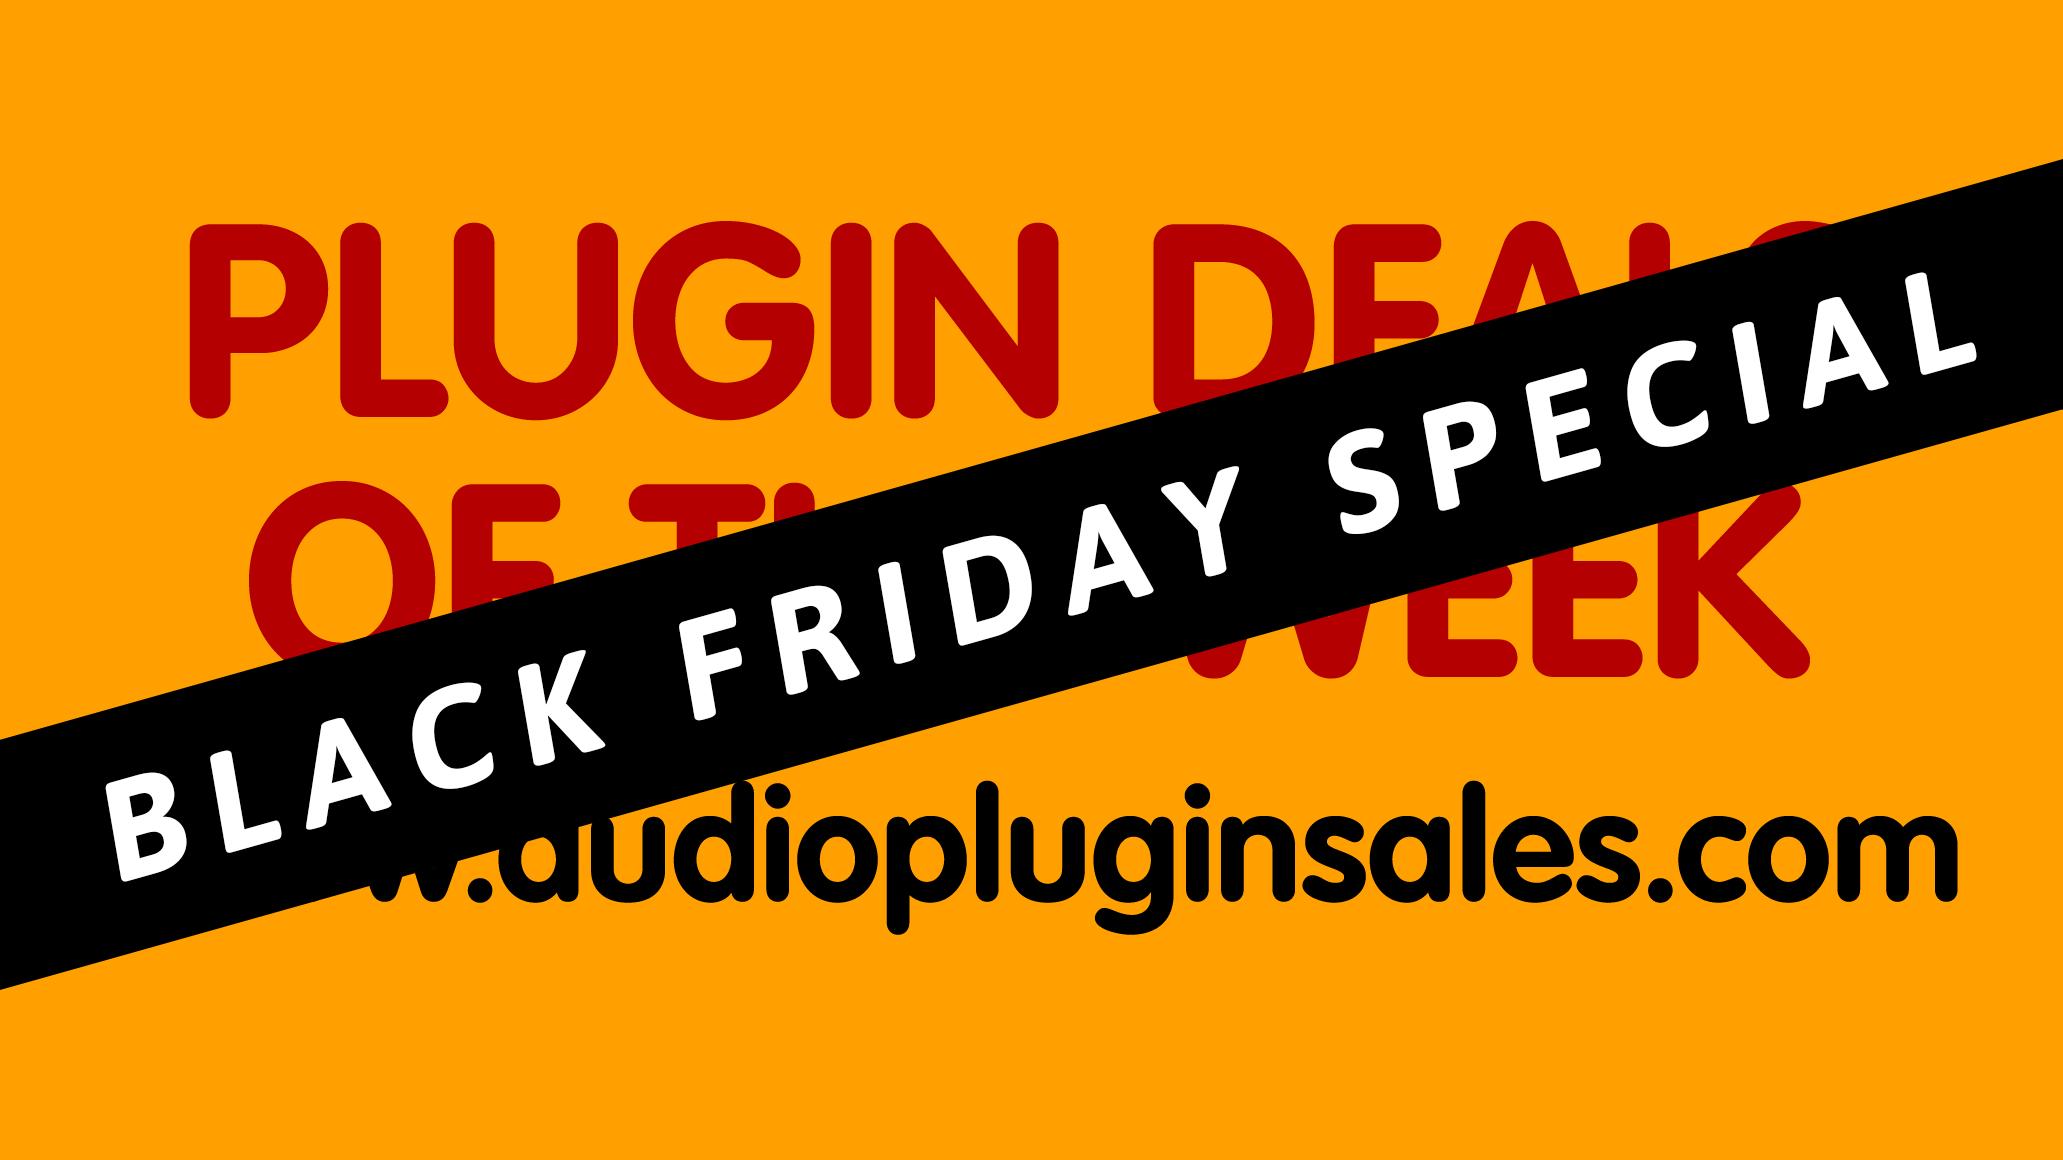 The Best Plugin Deals Of 2020 Week 45 Black Friday Special No 1 Audio Plugin Sales